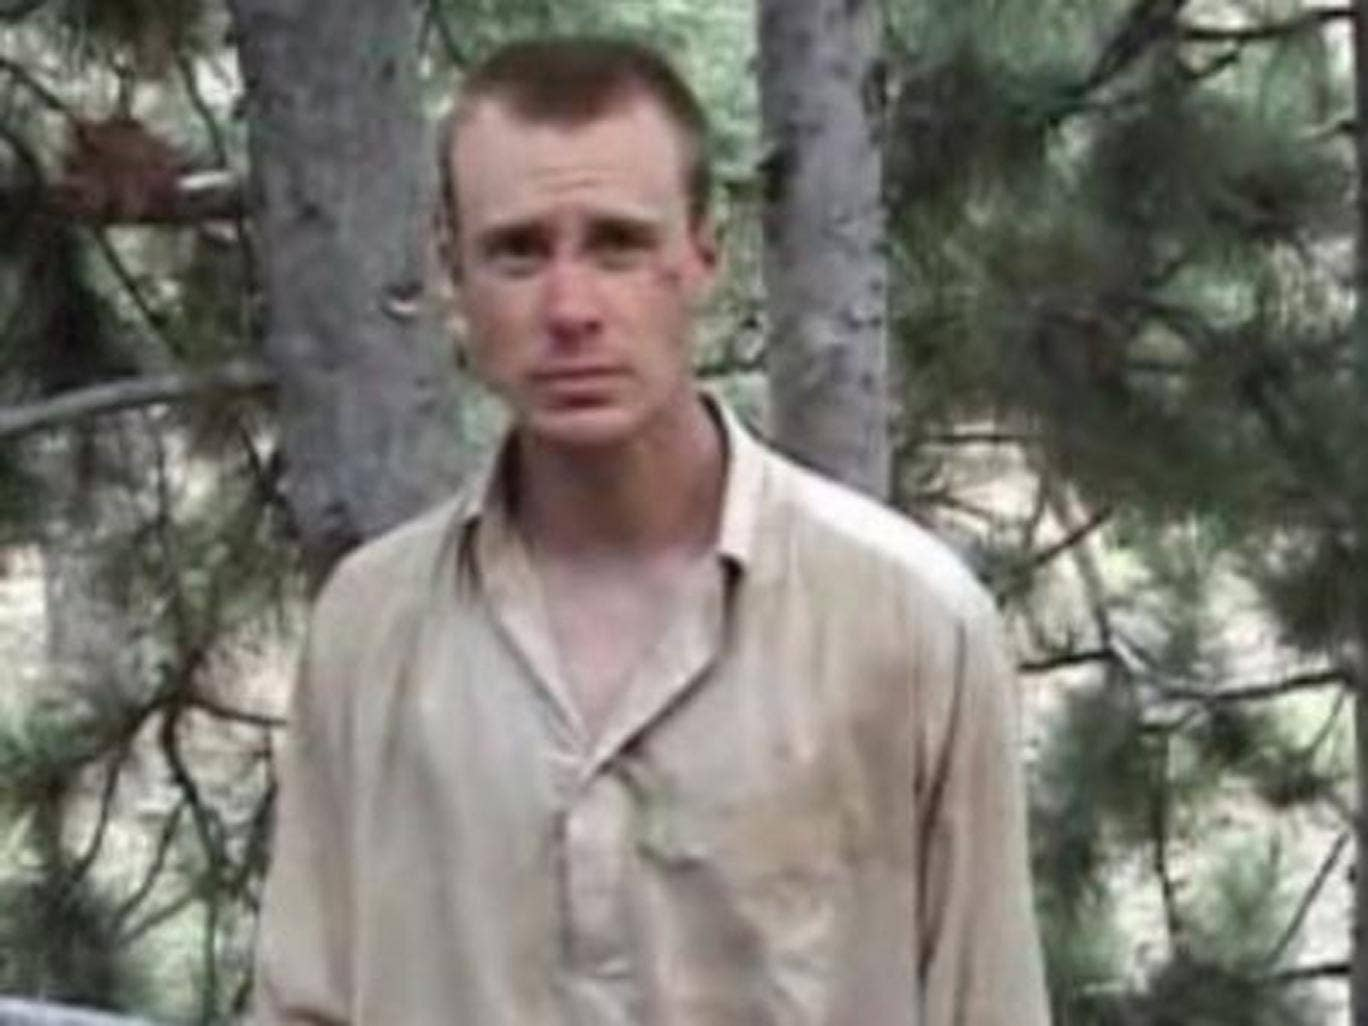 Sergeant Bowe Bergdahl pictured in a Taliban video in 2010